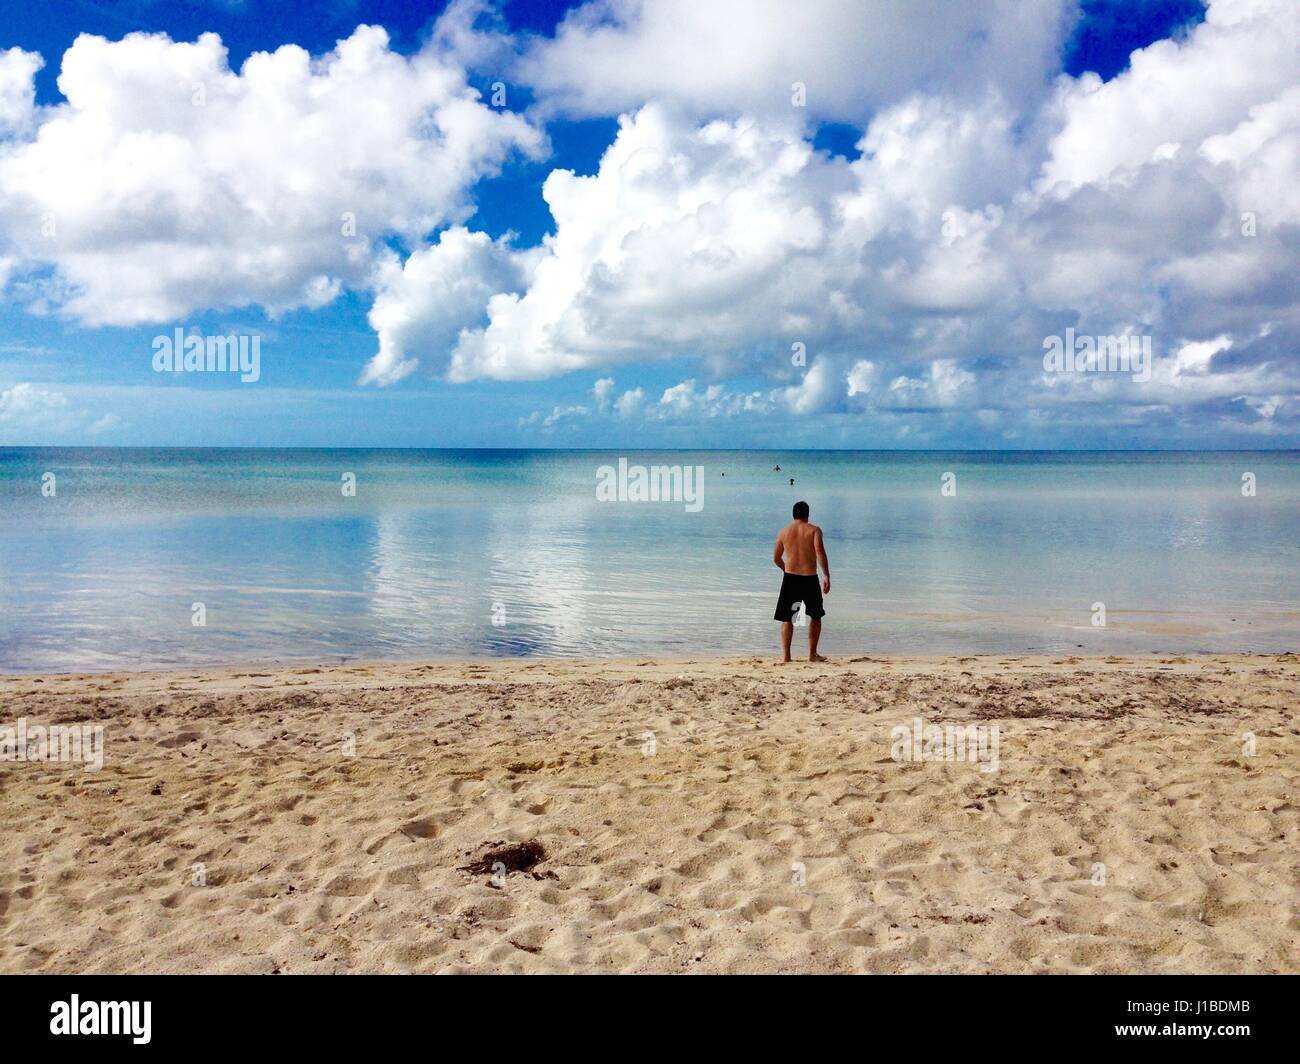 Coco Di Mama Dies War Mein Erstes Mal In Eleuthera Ein Bahama